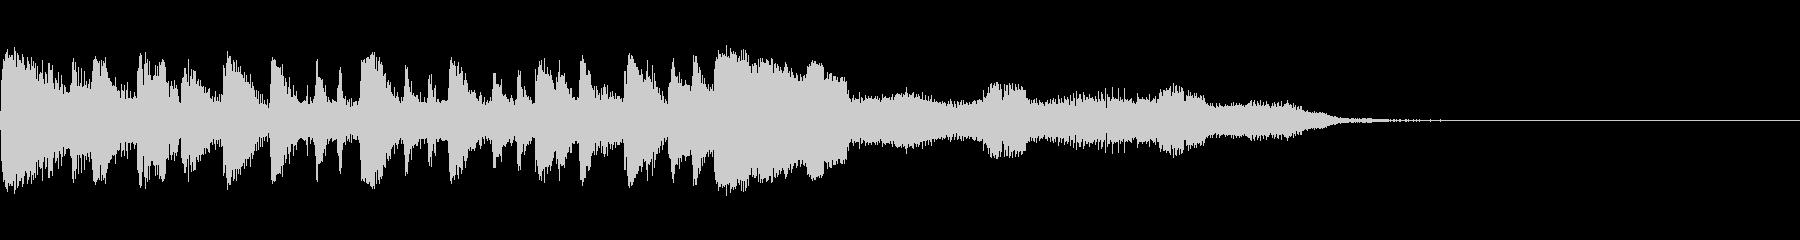 JUNKYARD TAG 2の未再生の波形